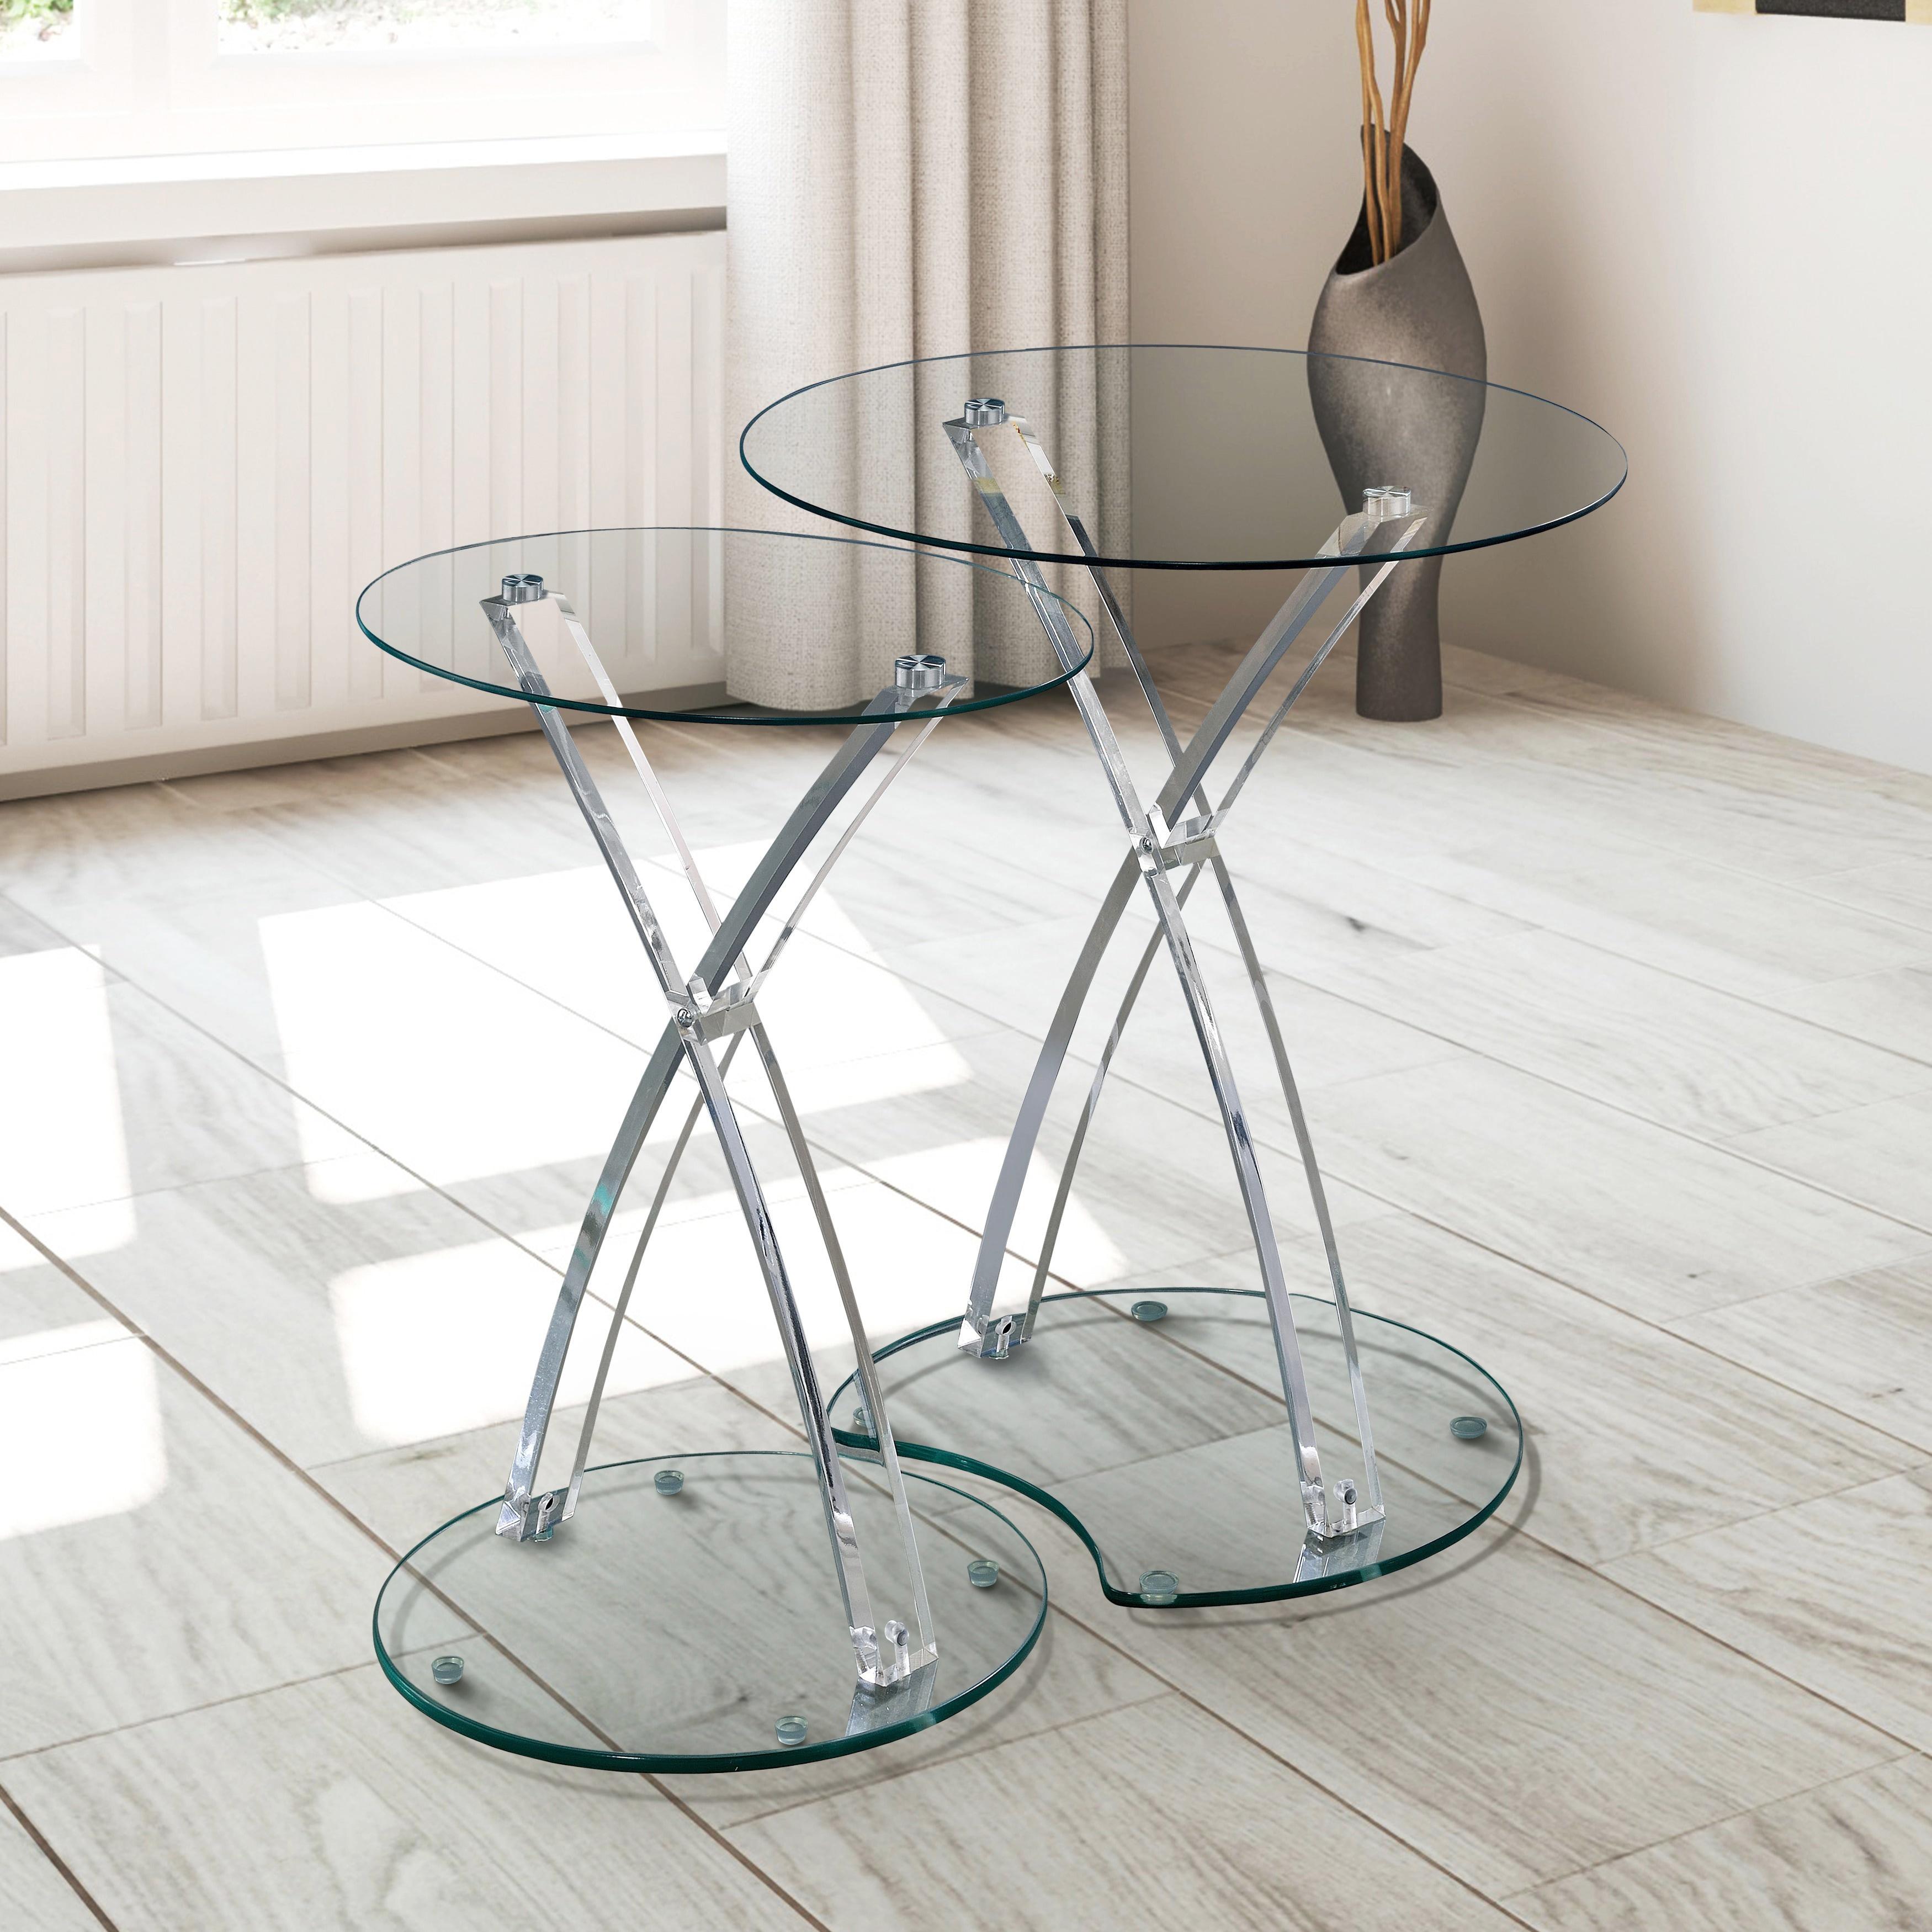 Furniture of America Luna Contemporary Clear Glass Acryli...